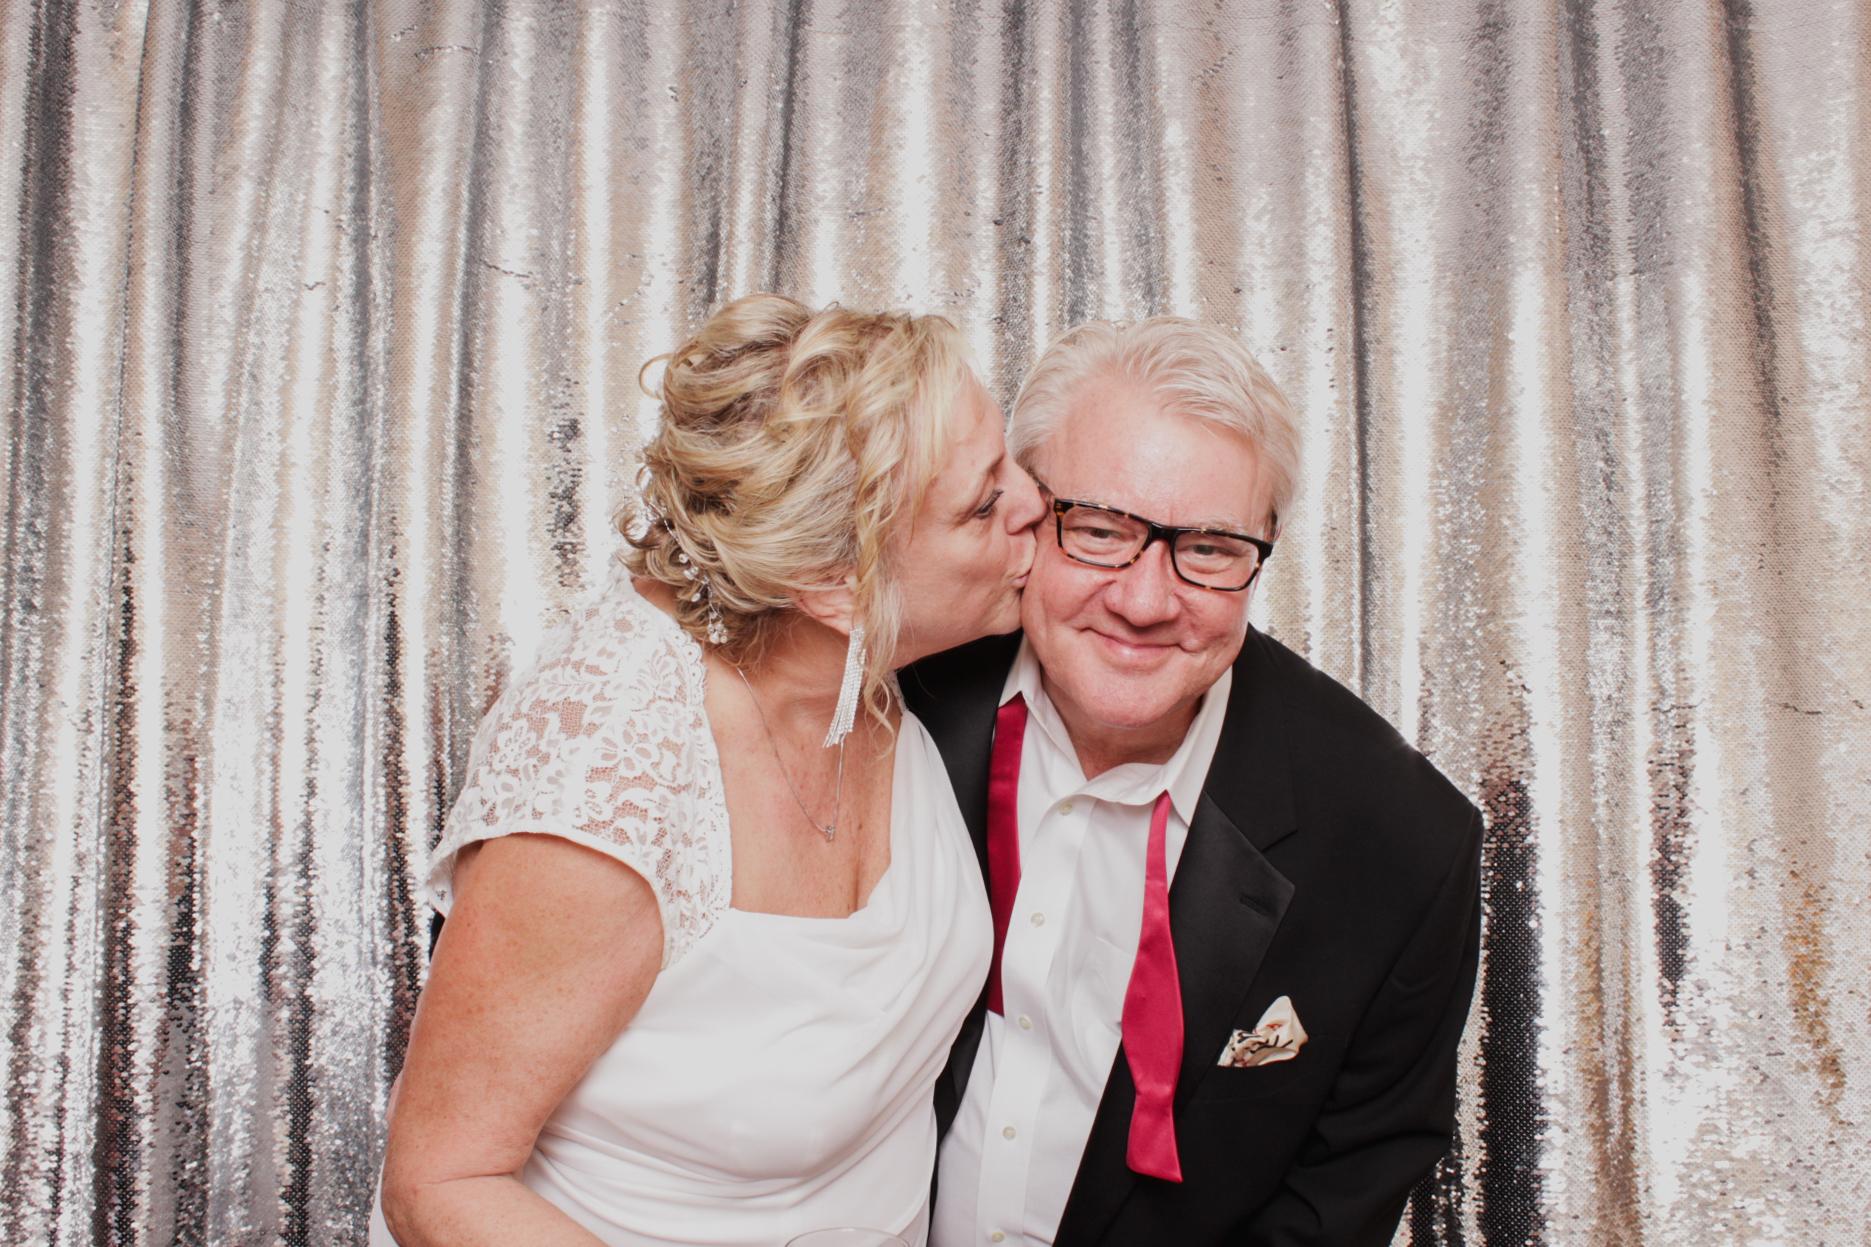 Lewis Ginter Wedding